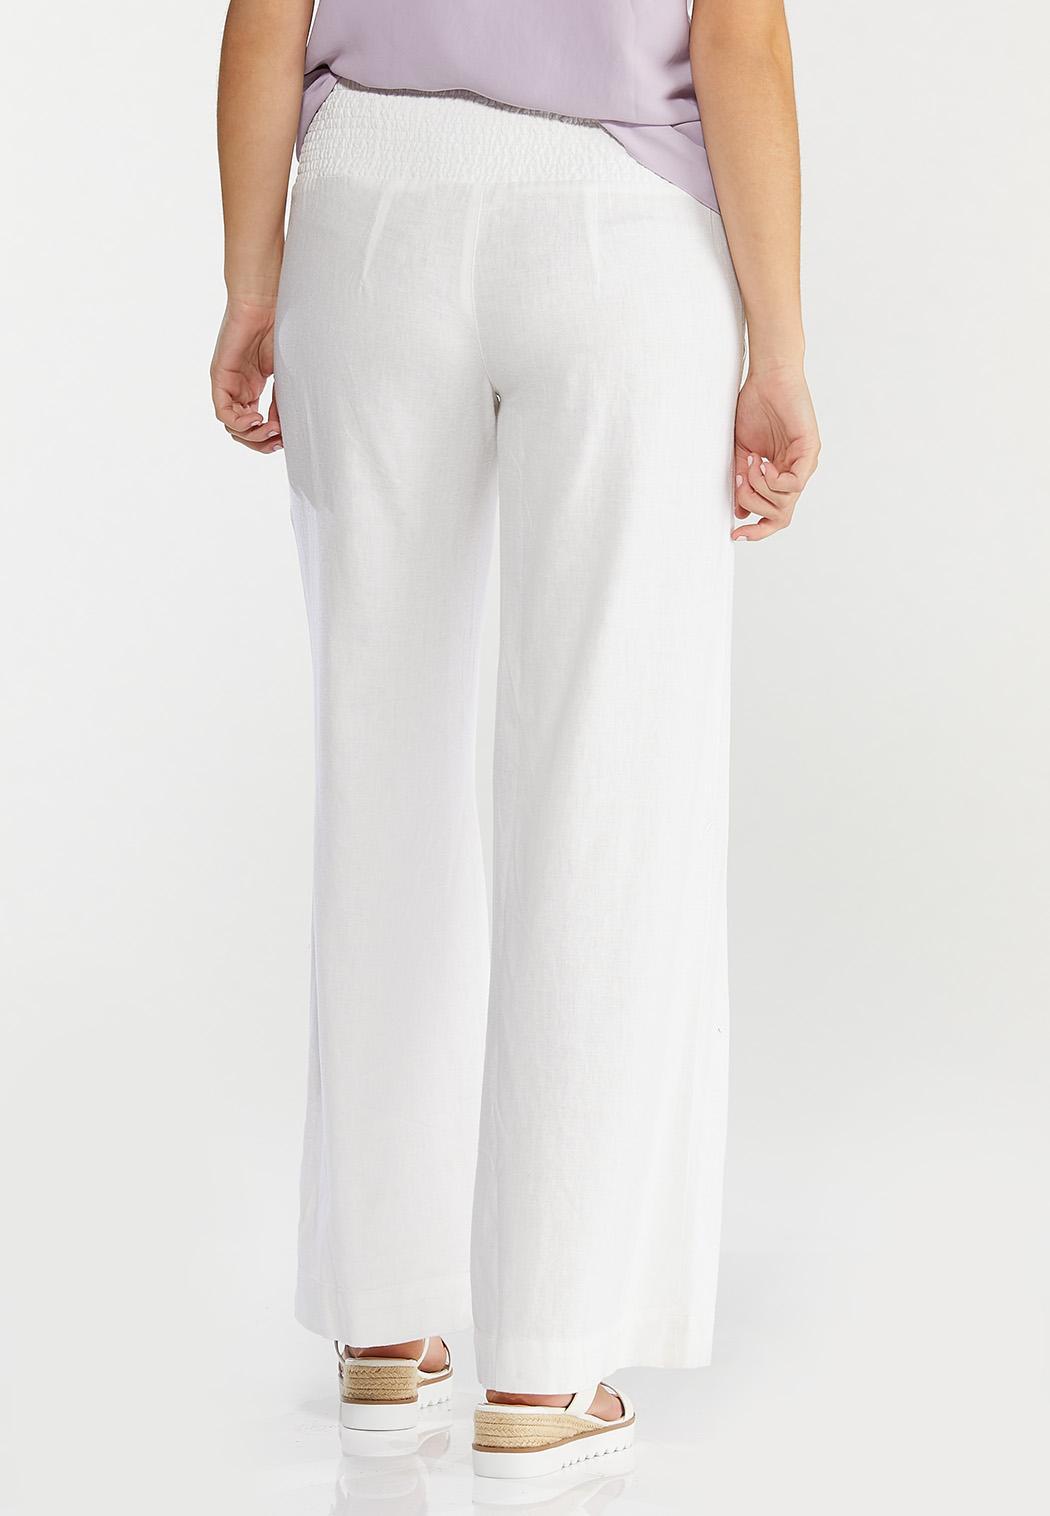 Pull-On Linen Pants (Item #44508328)